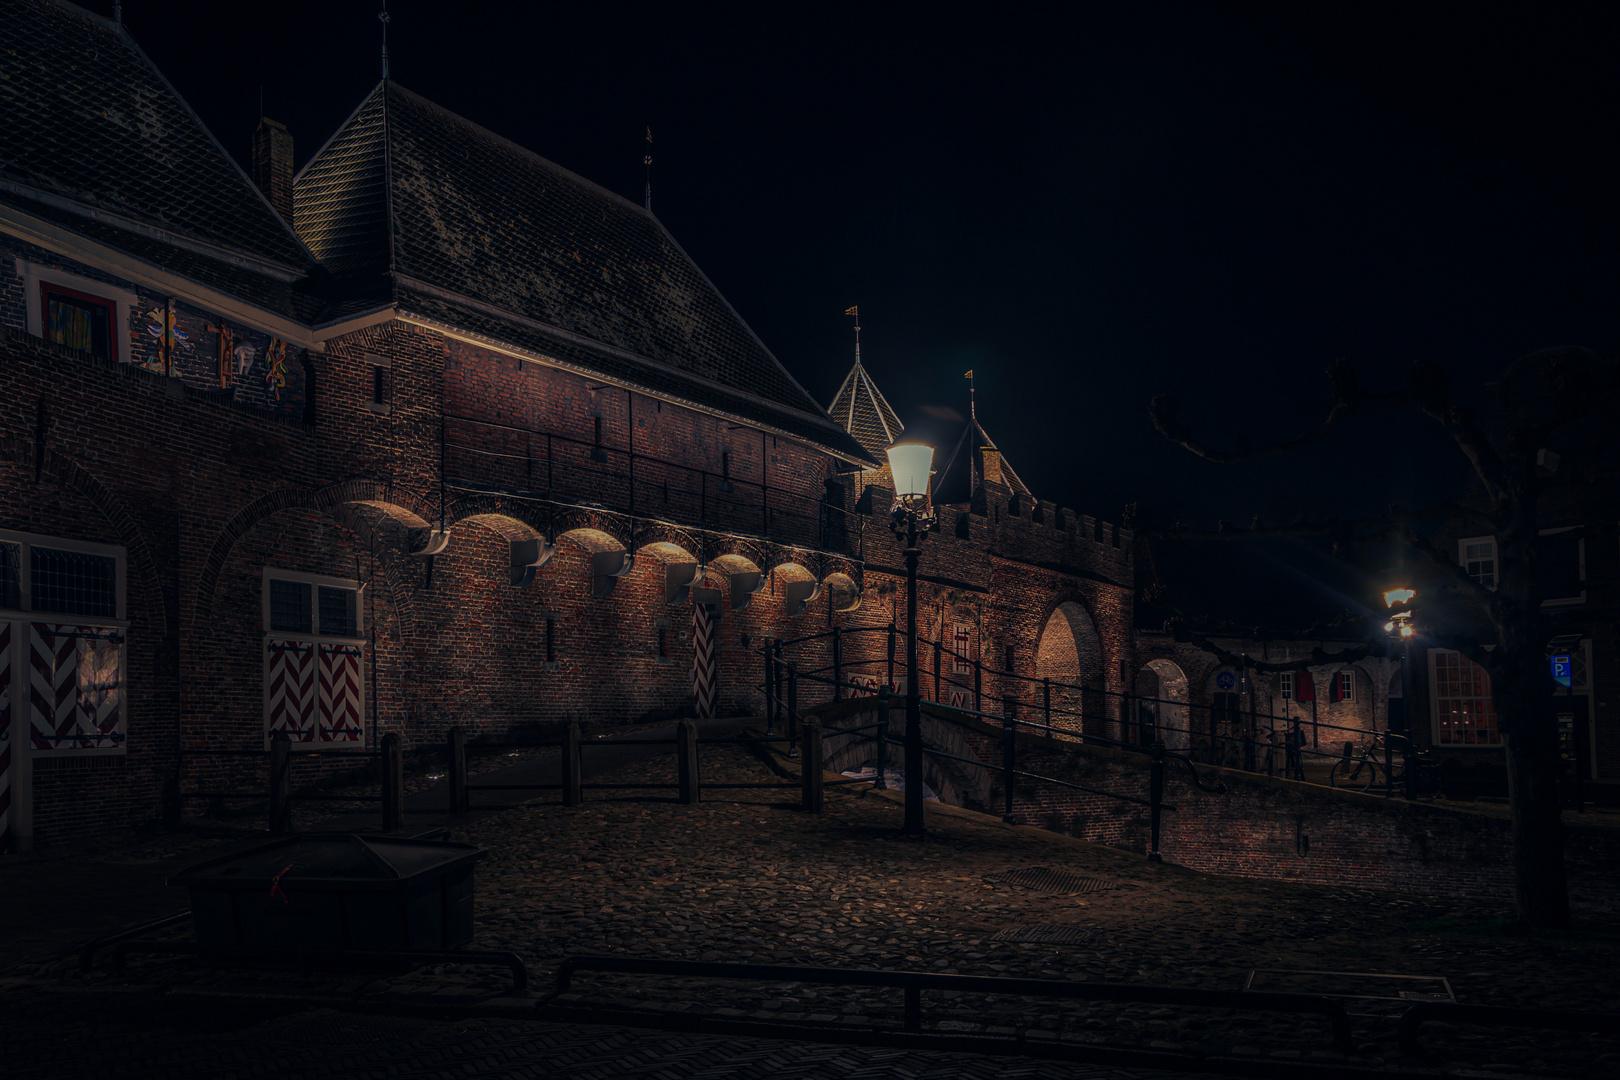 Amersfoort bei Nacht